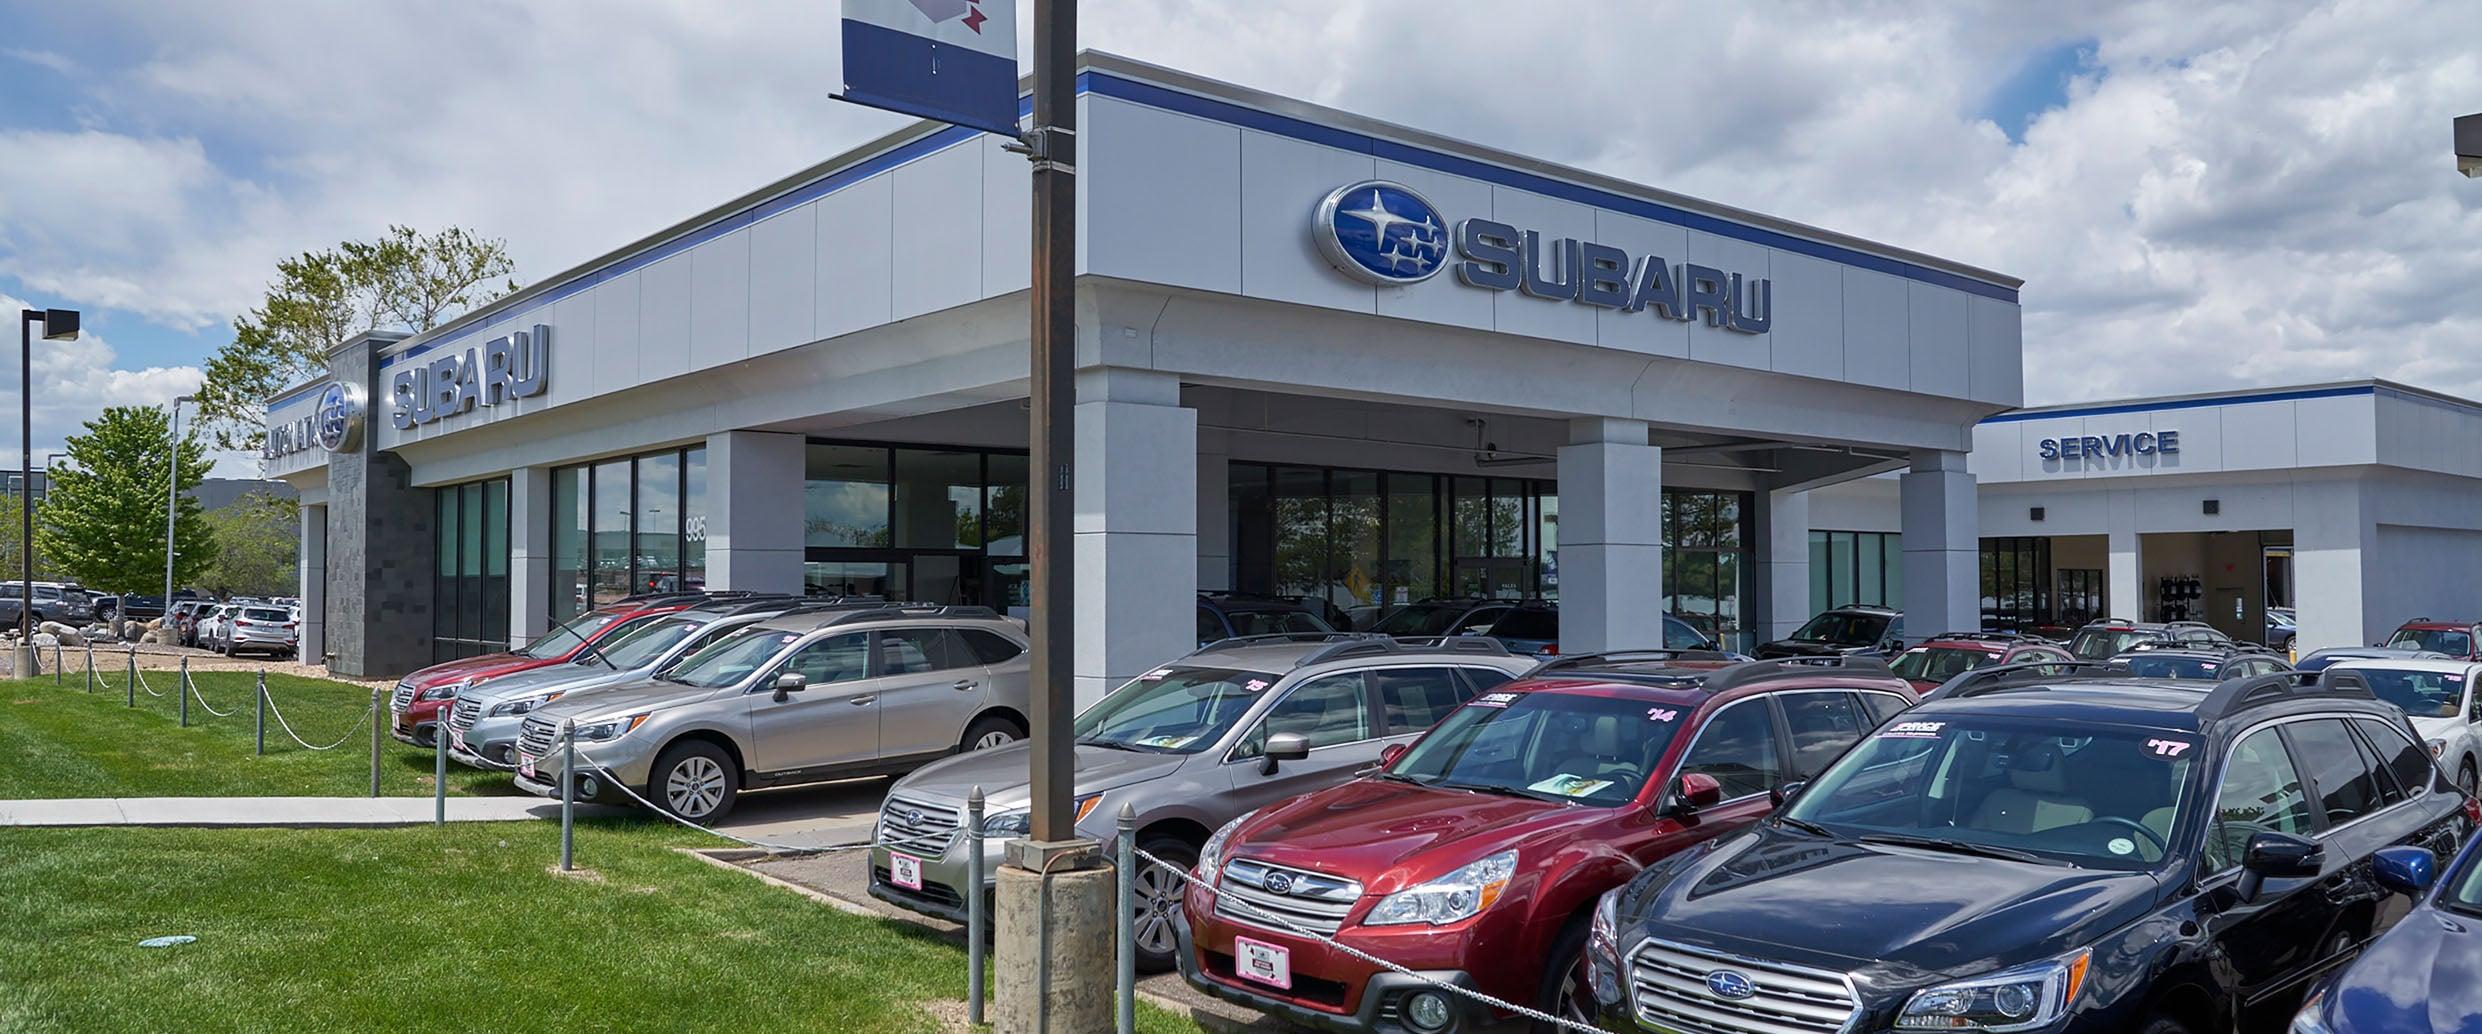 Autonation Subaru Arapahoe New Dealership In Centennial Co Joy Long Van Electrical Fuse Box Welcome